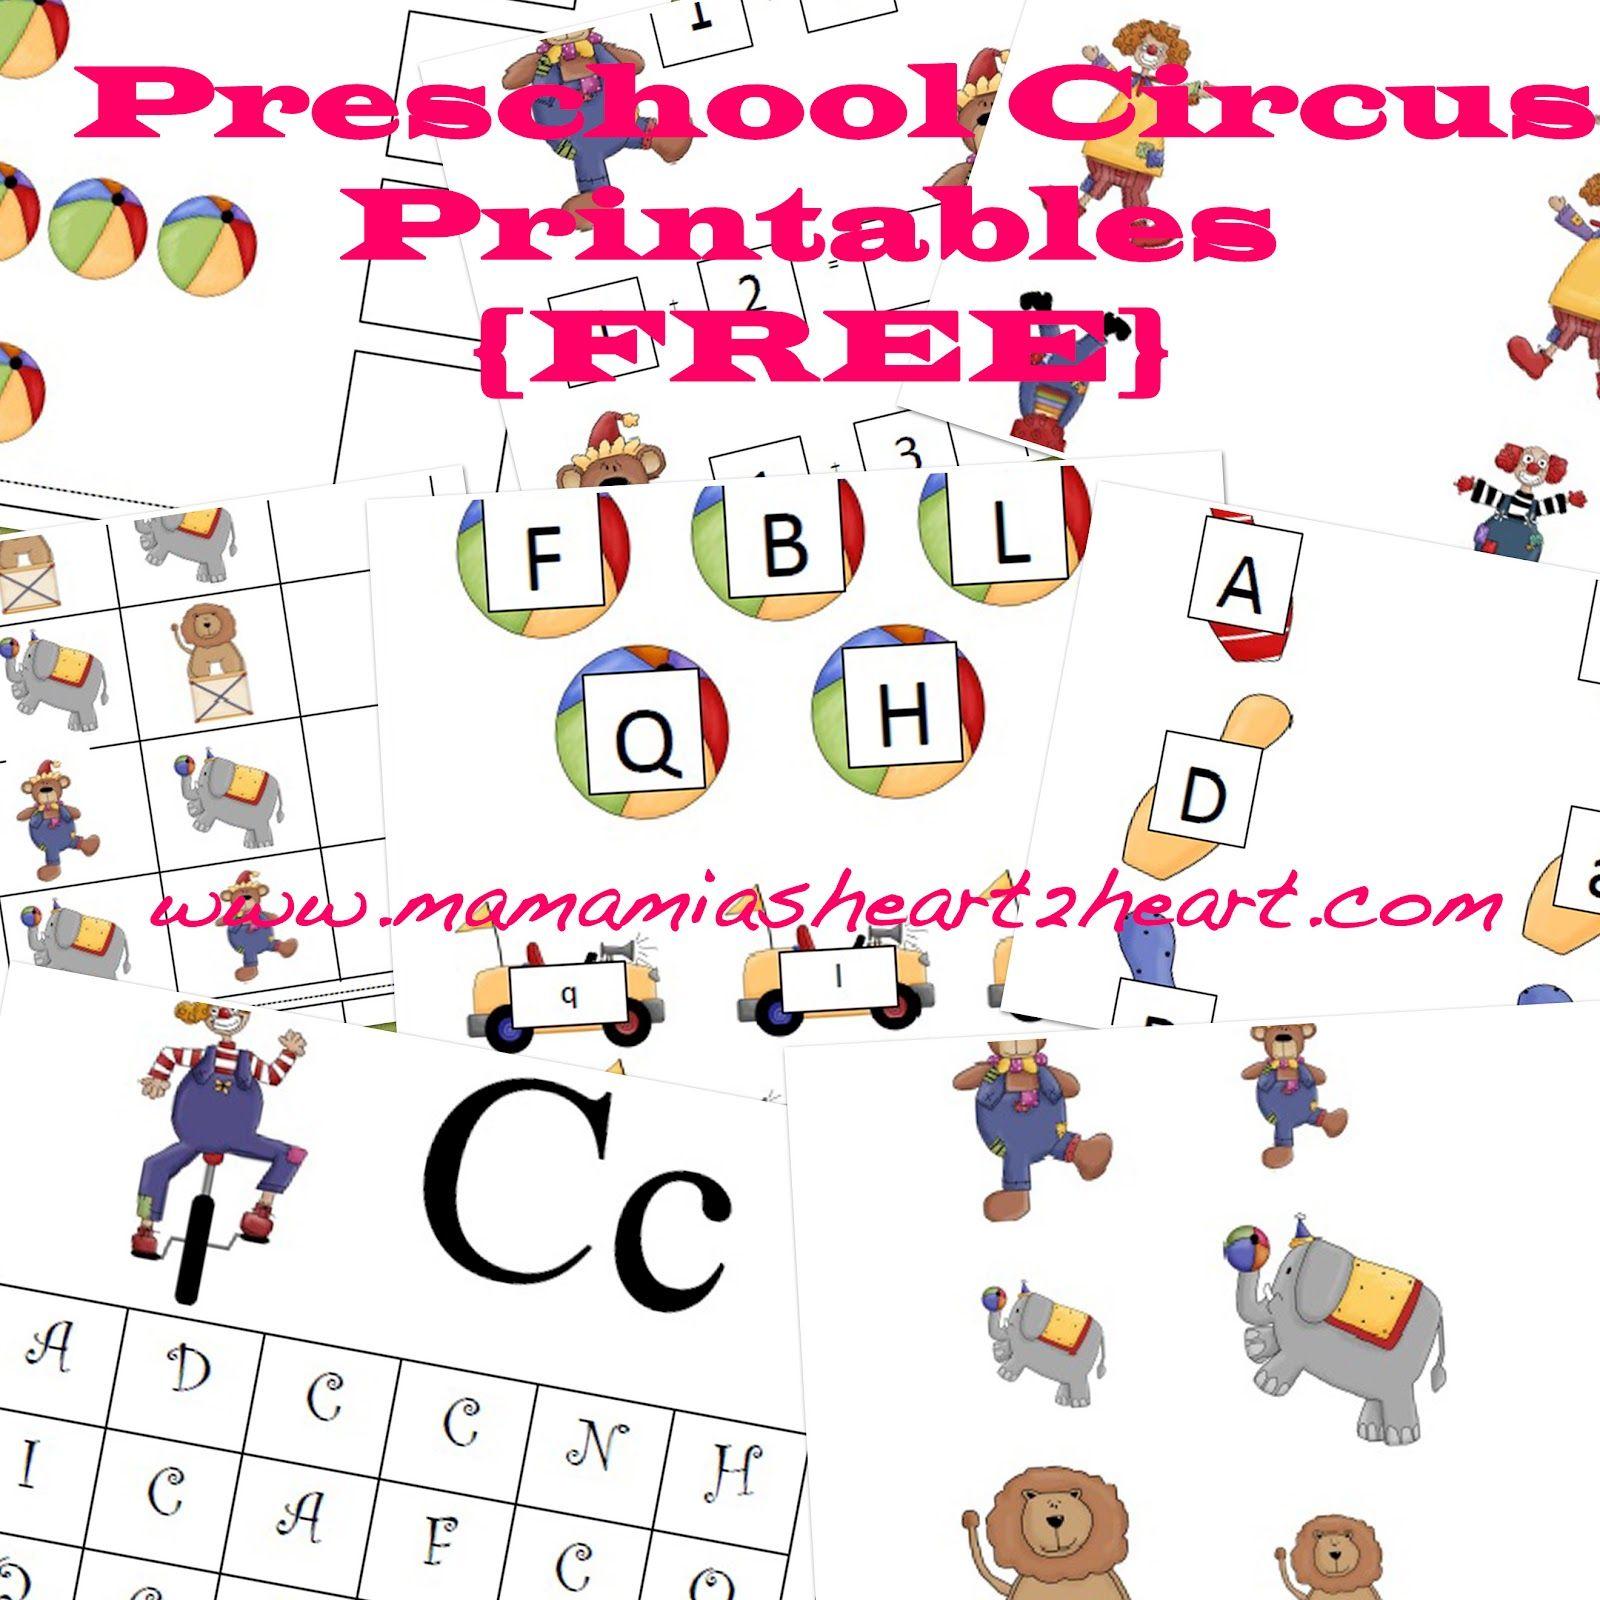 Mama Mia S Heart2heart Preschool Circus Printables Free